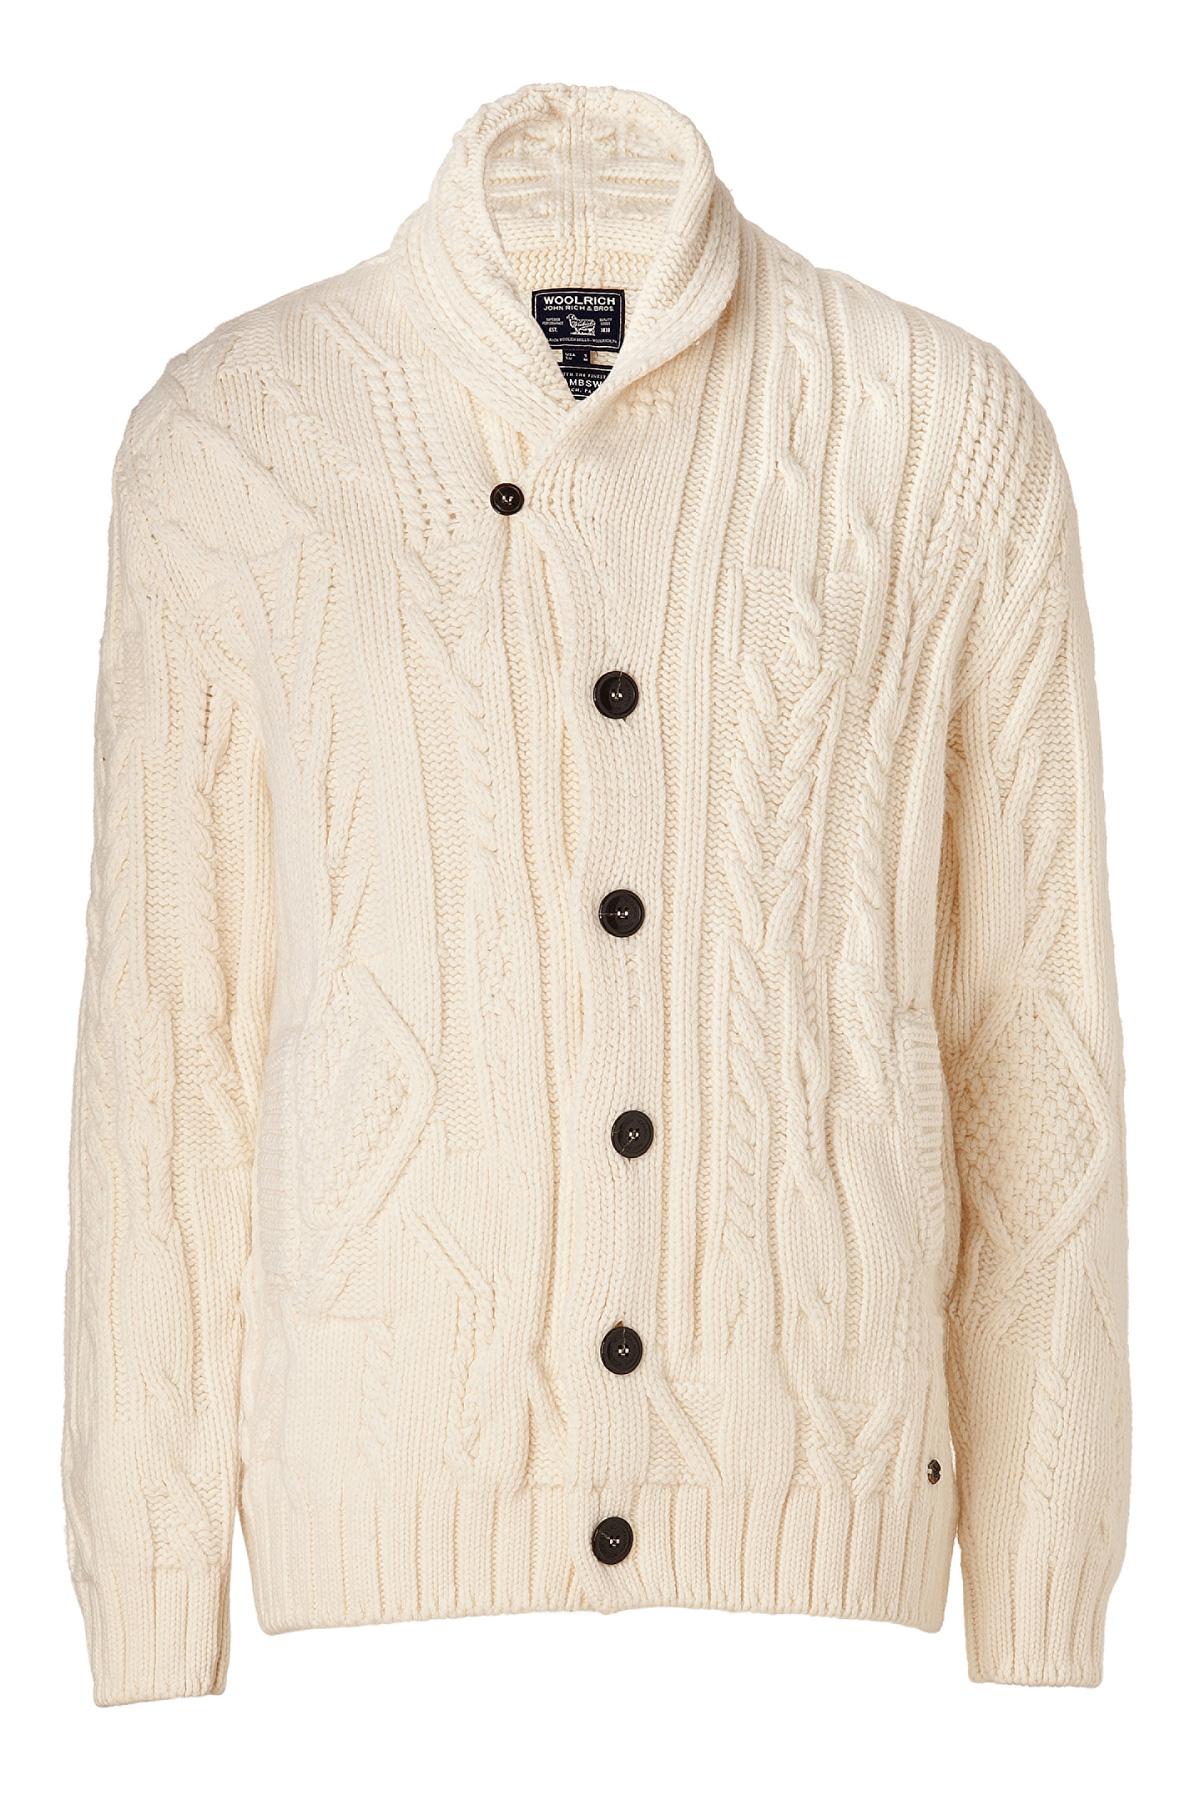 Woolrich White Wool Shawl Collar Aran Cardigan in Natural for Men ...